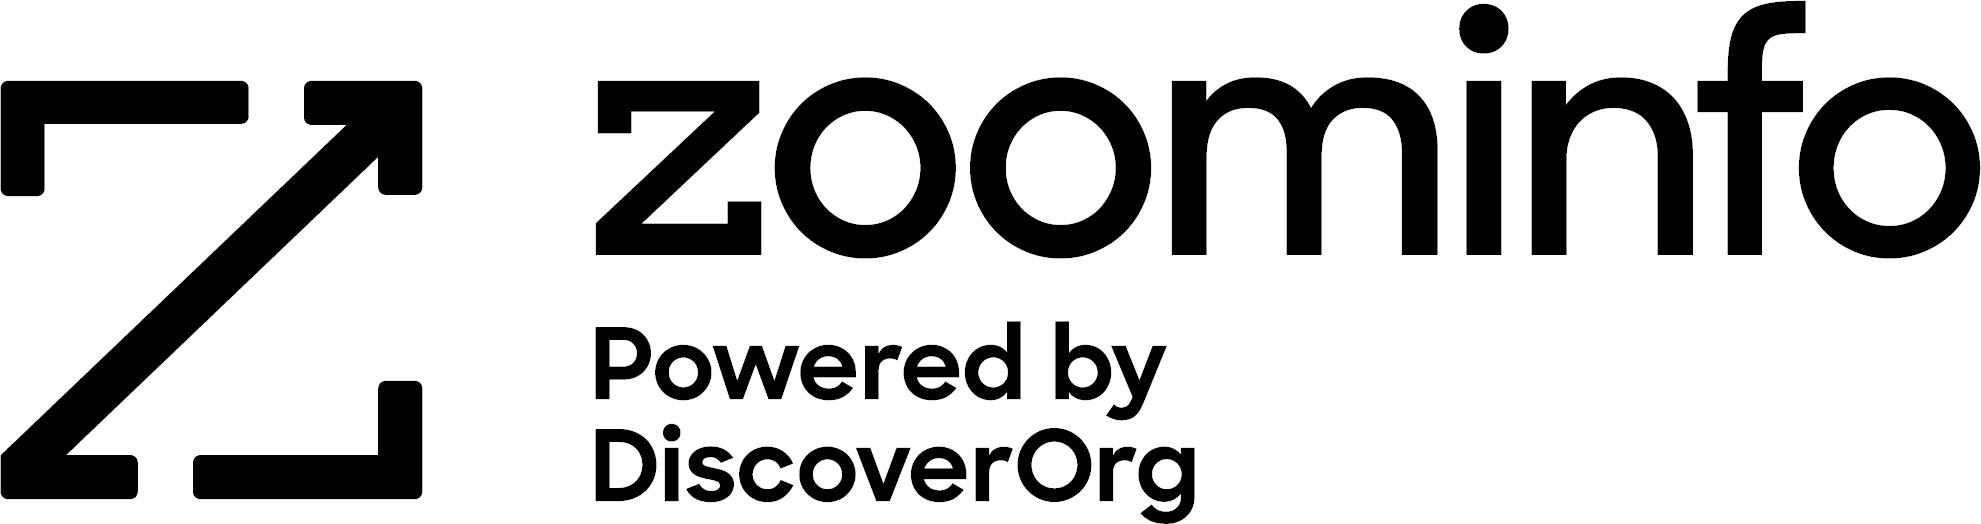 https://cdn.kscope.io/08d168805096a6283434c3496b677838-zoominfologo1b.jpg